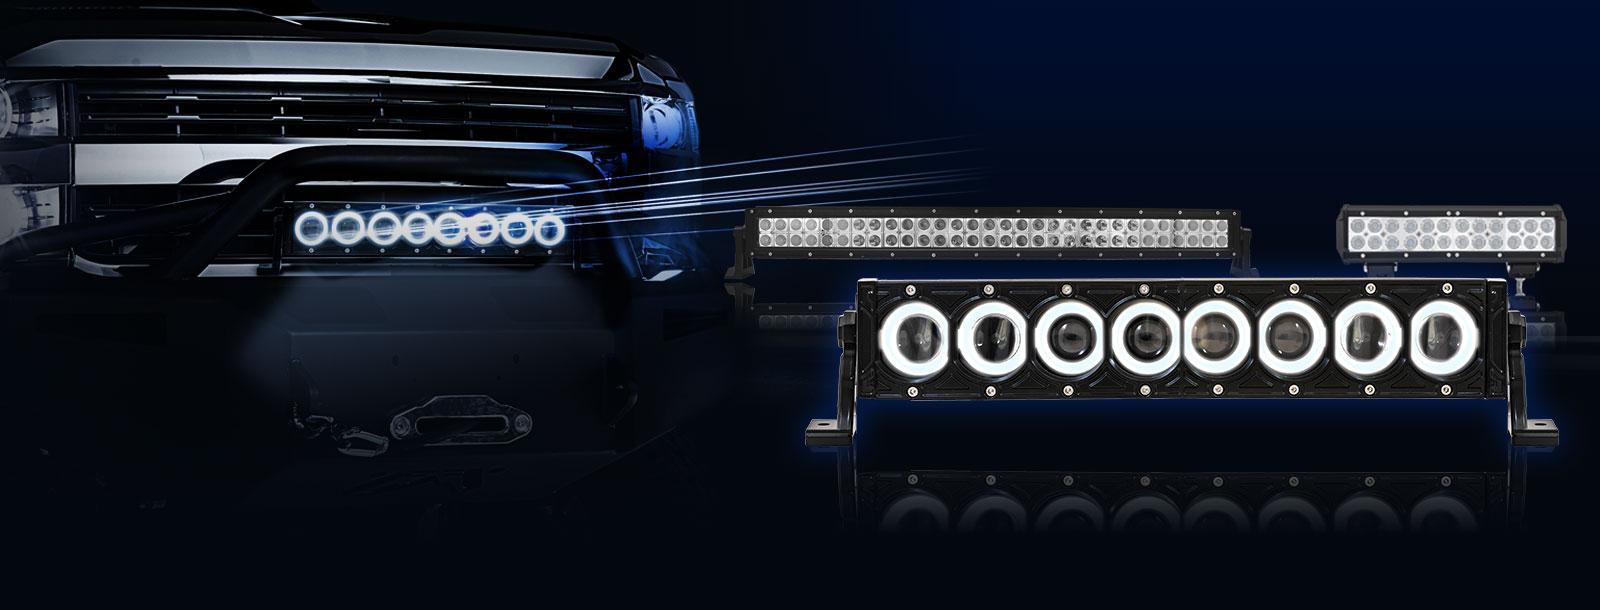 Trux's Light Bars